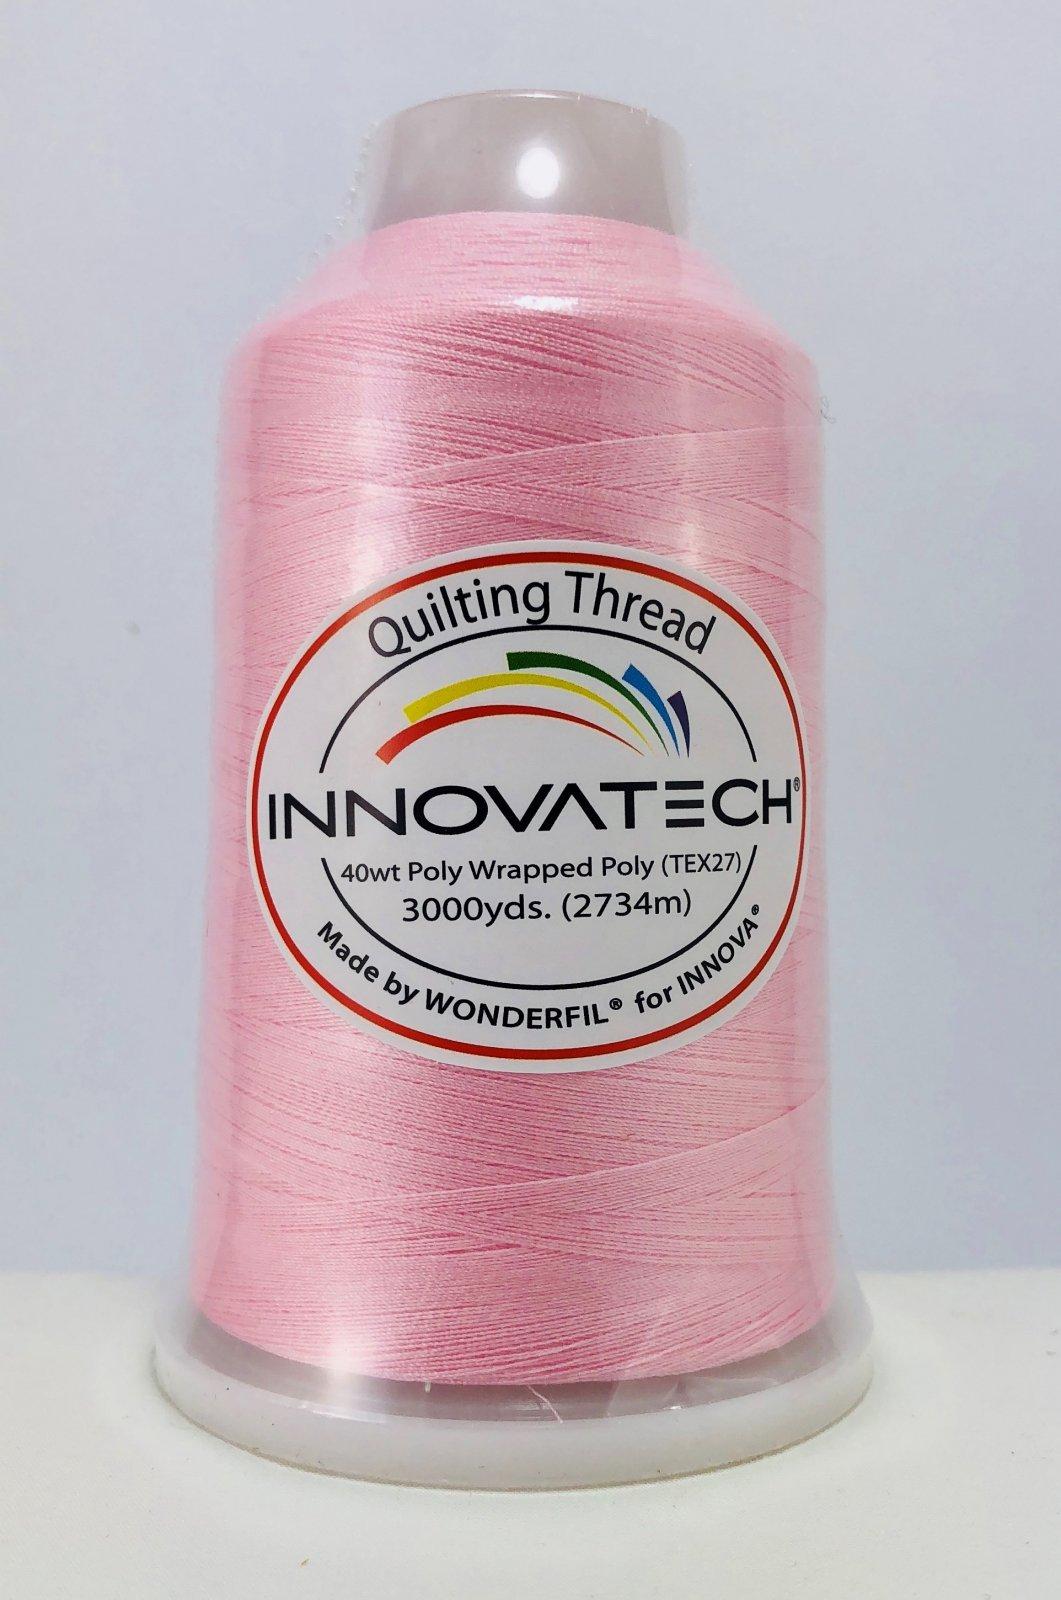 Innovatech Thread Blossom